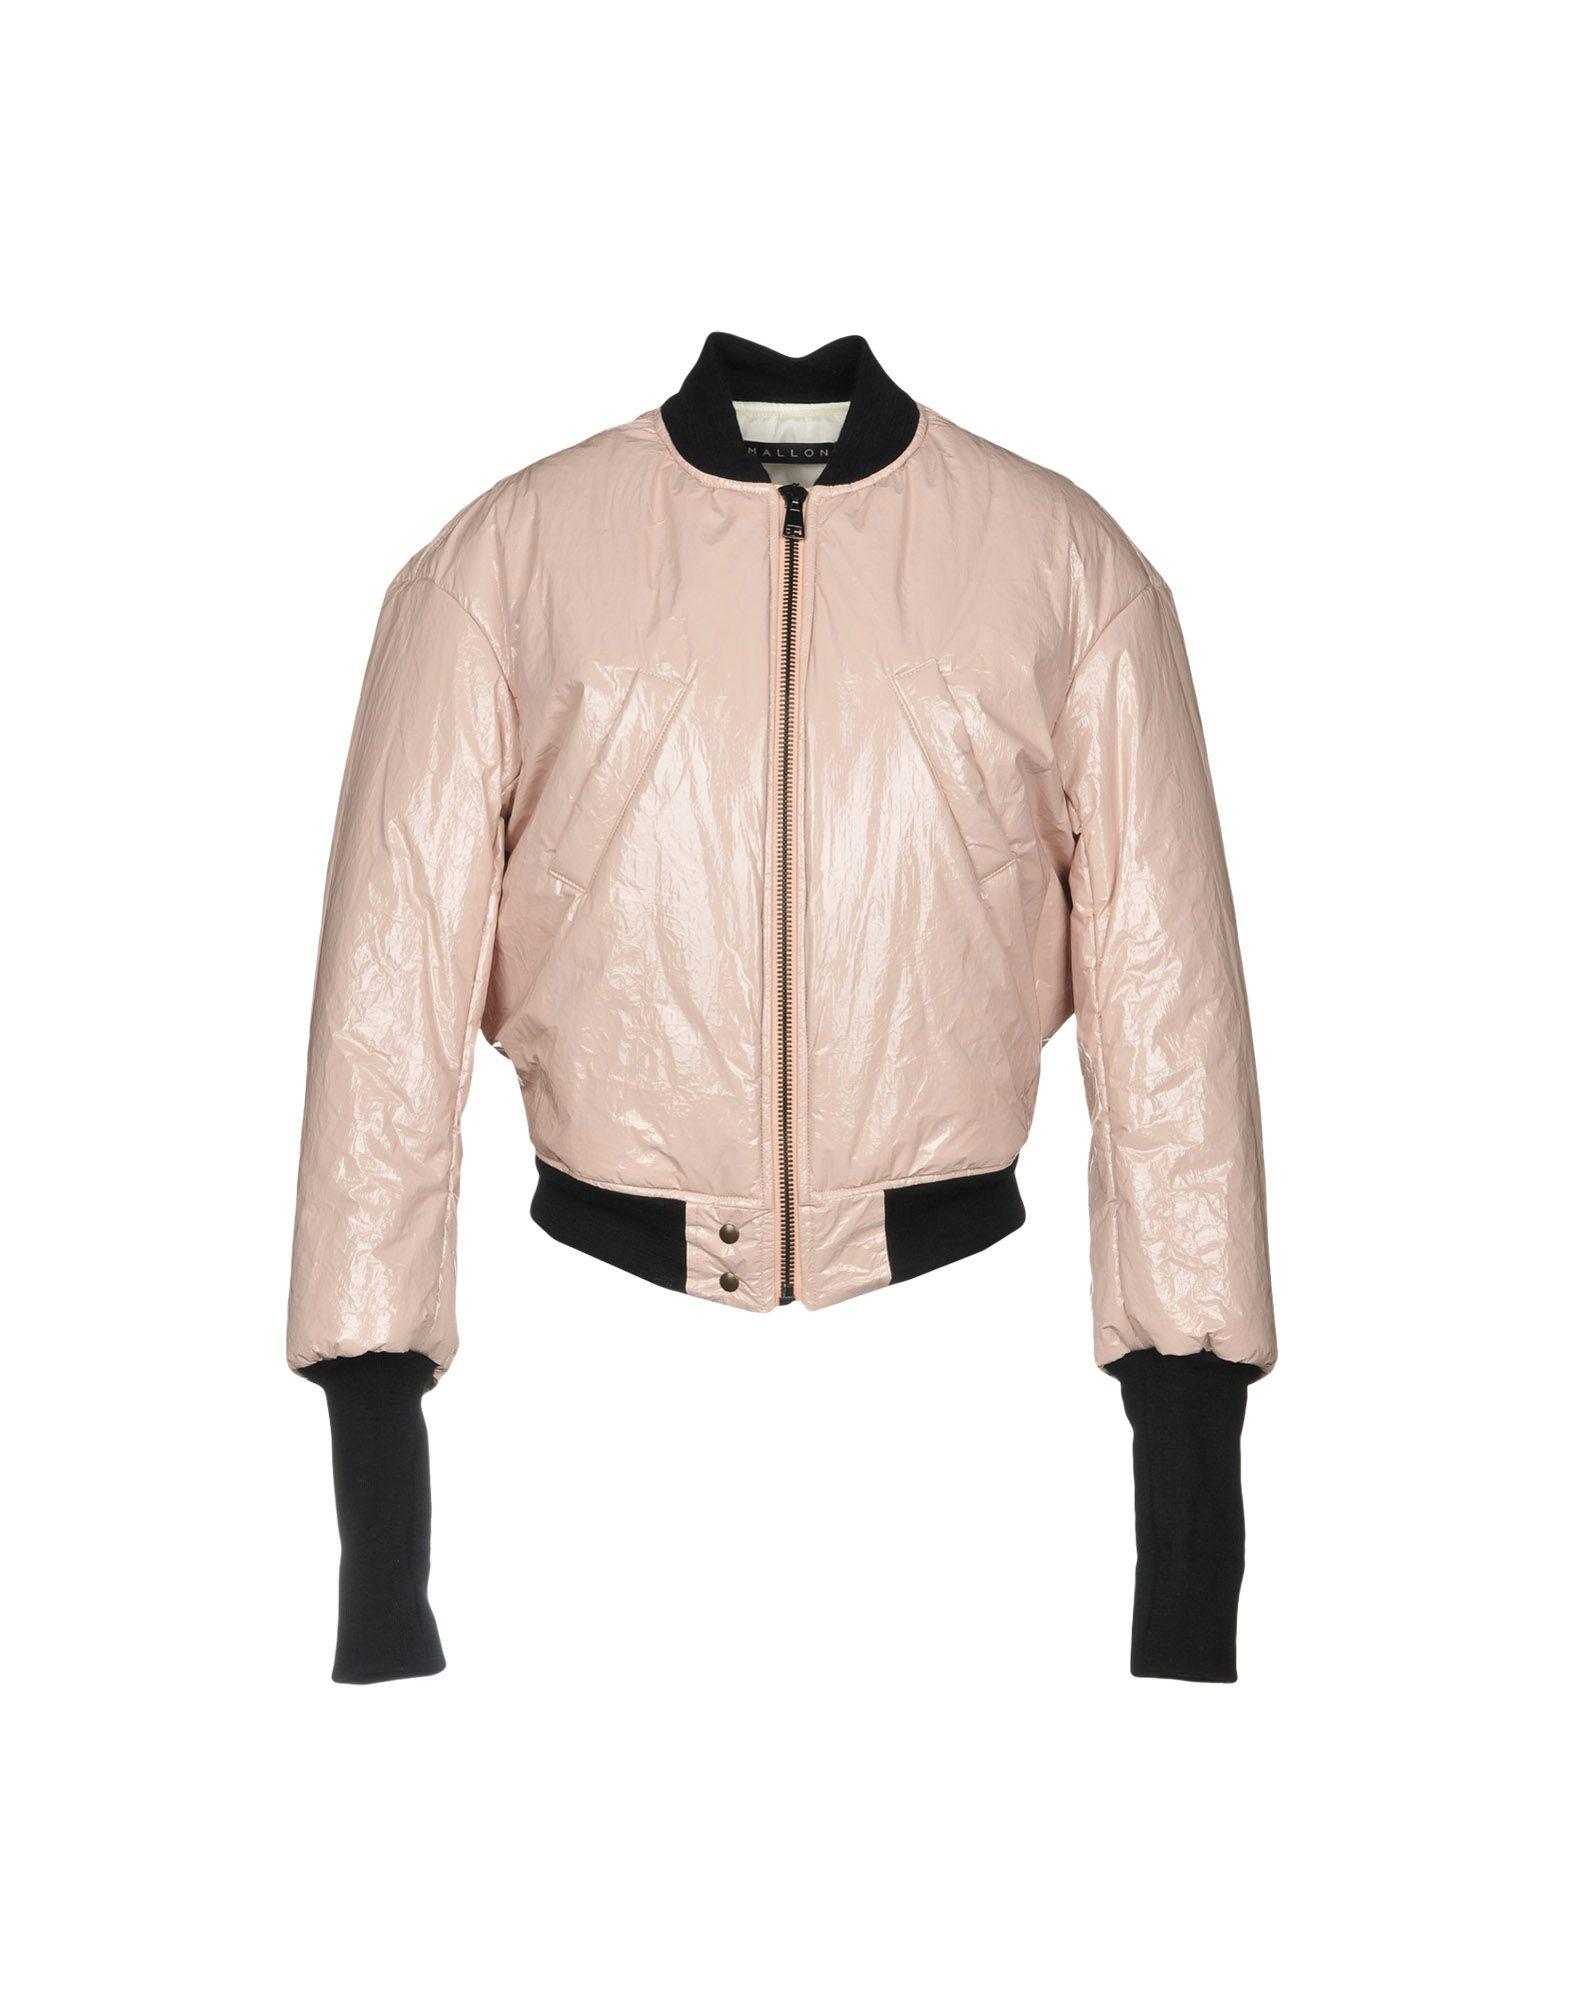 MALLONI Bomber in Light Pink